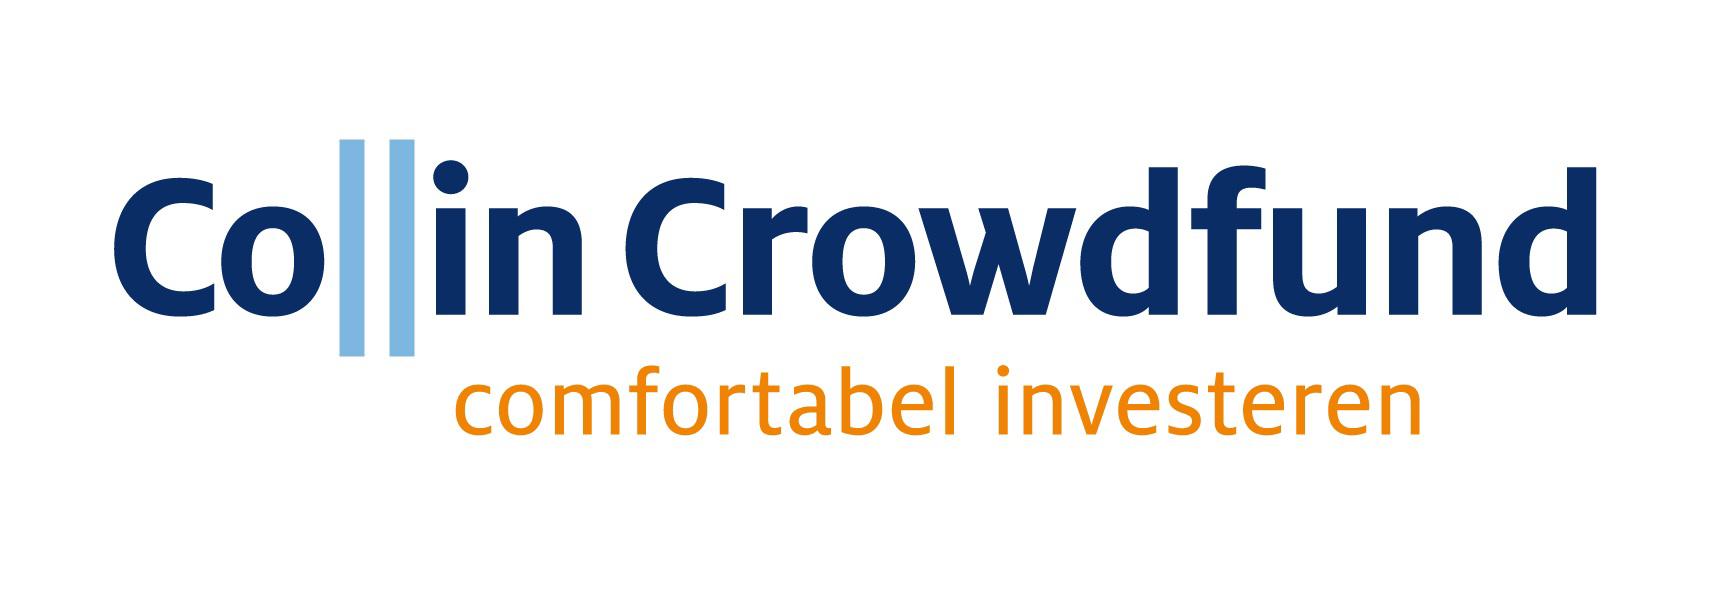 Ervaringen met investeren Collin Crowdfund